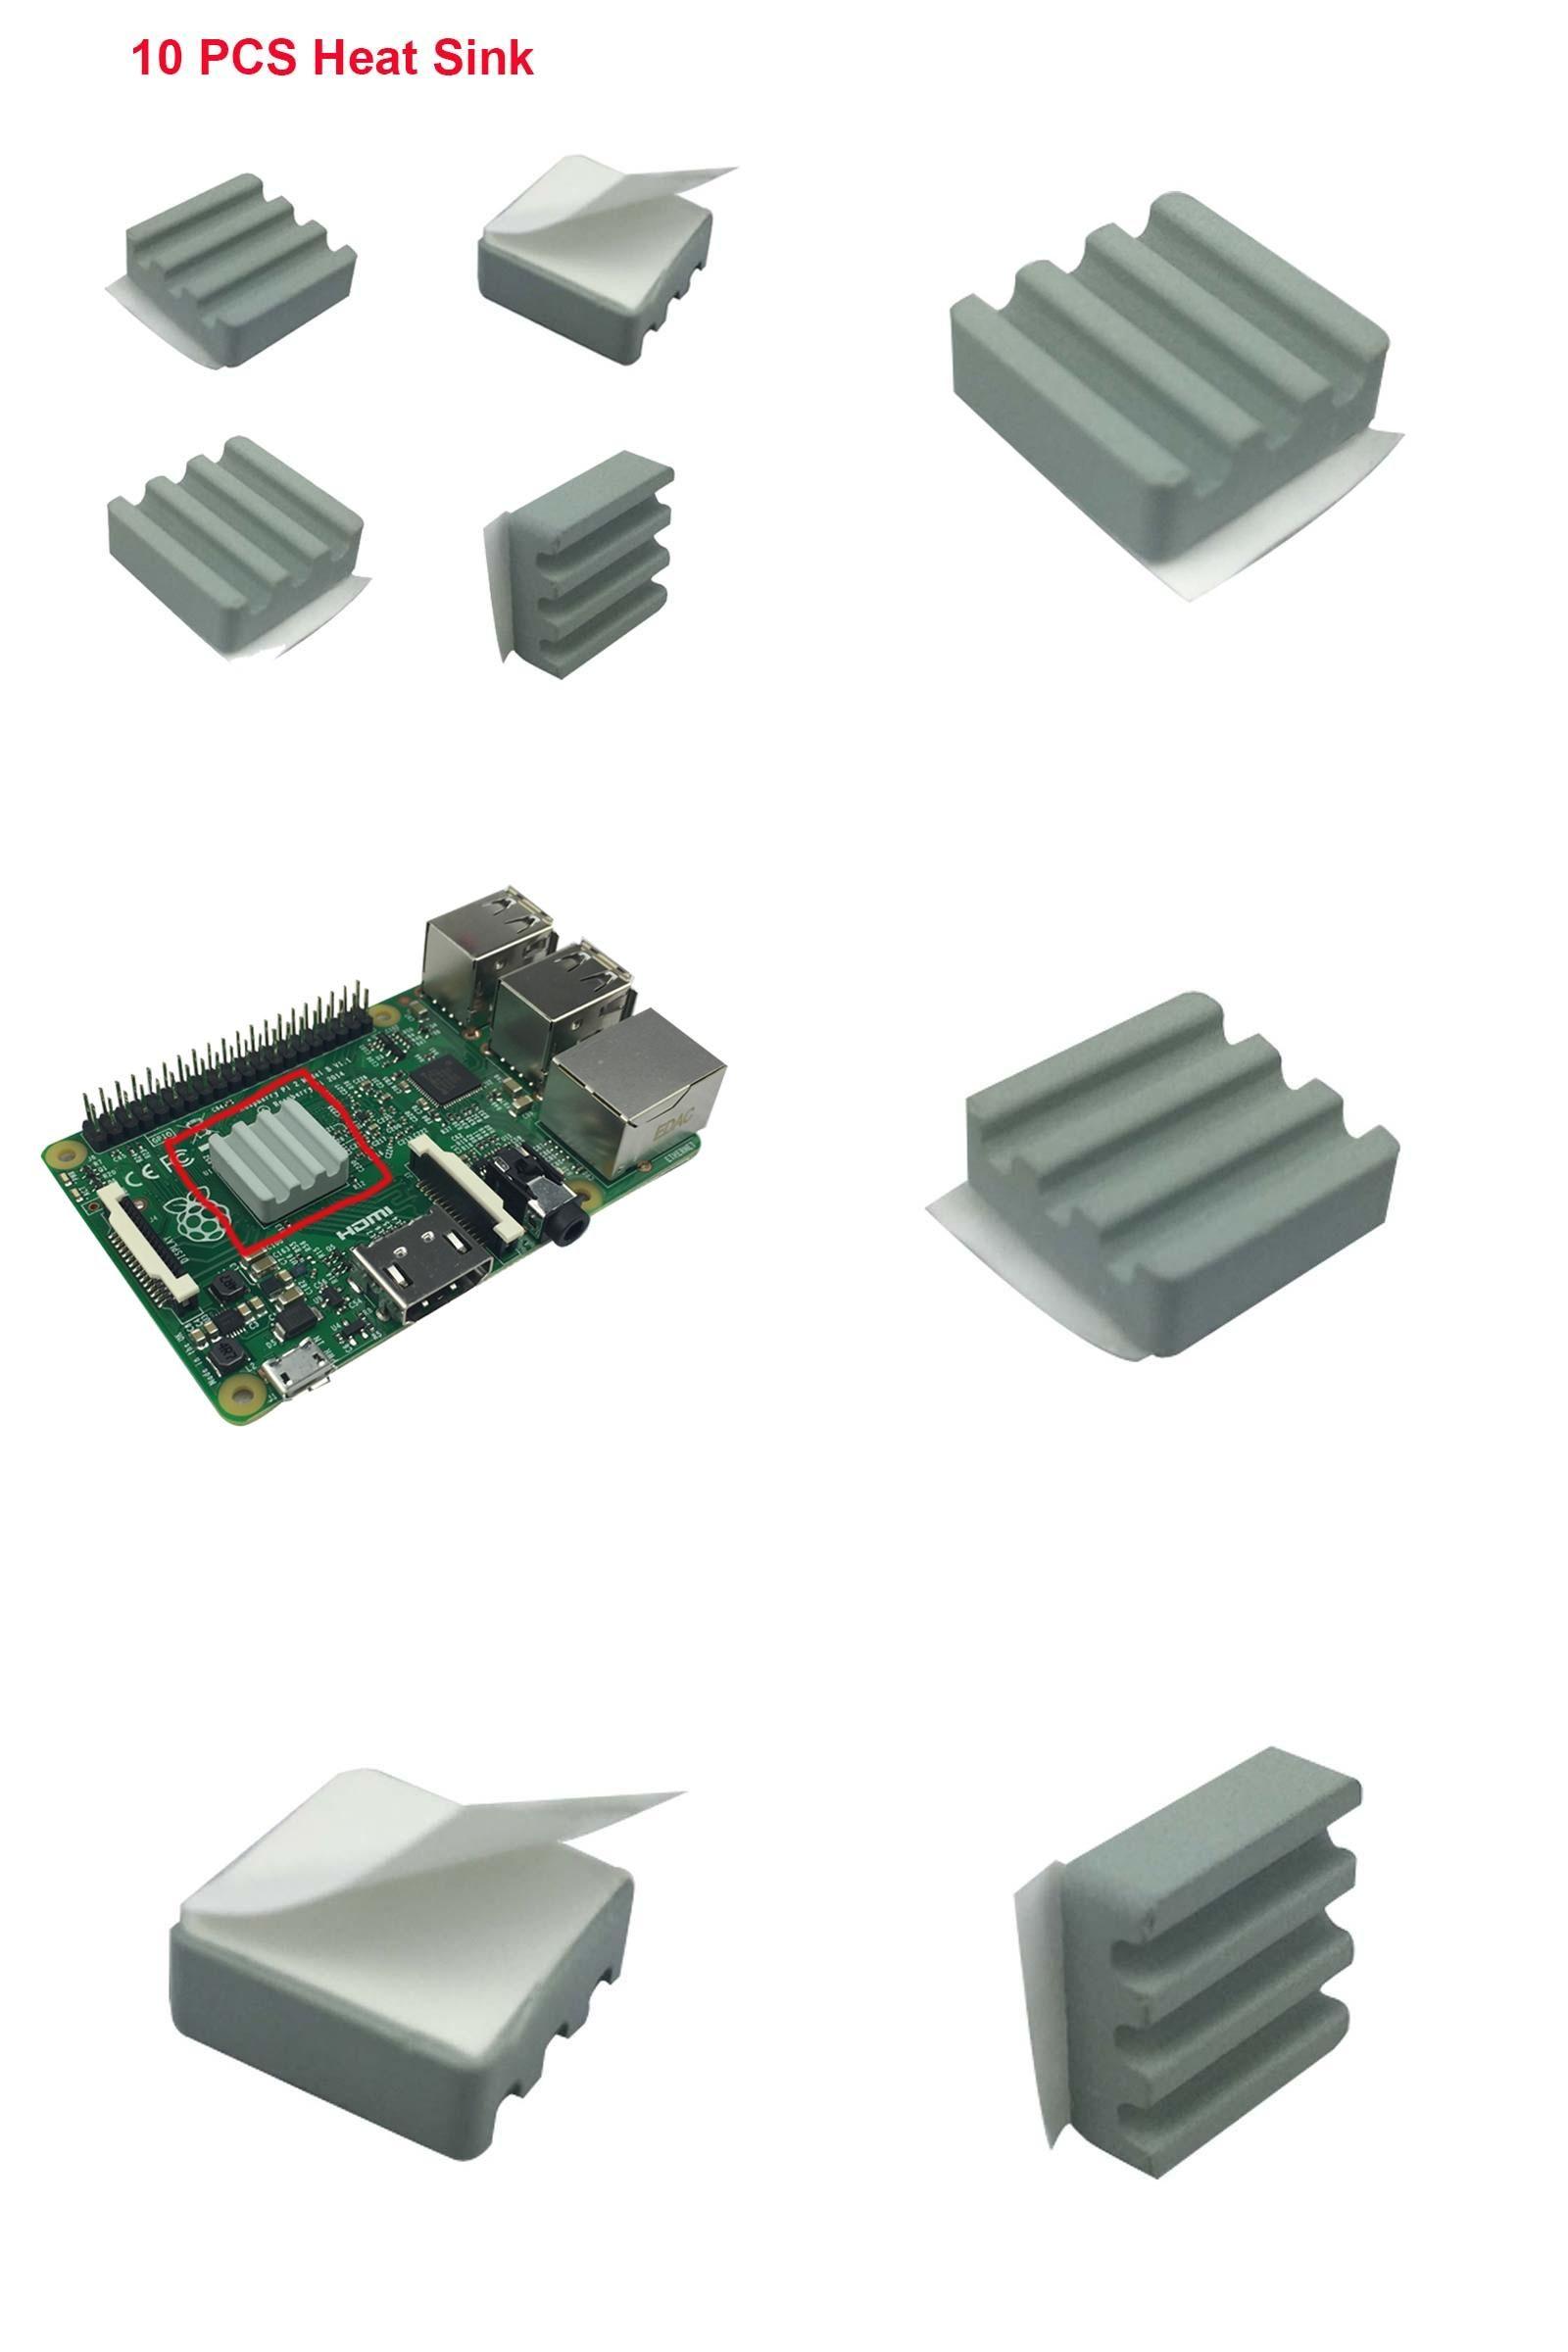 Visit to Buy] 10 PCS Raspberry Pi 3 Heat Sink Ceramic Heat Sinks CPU